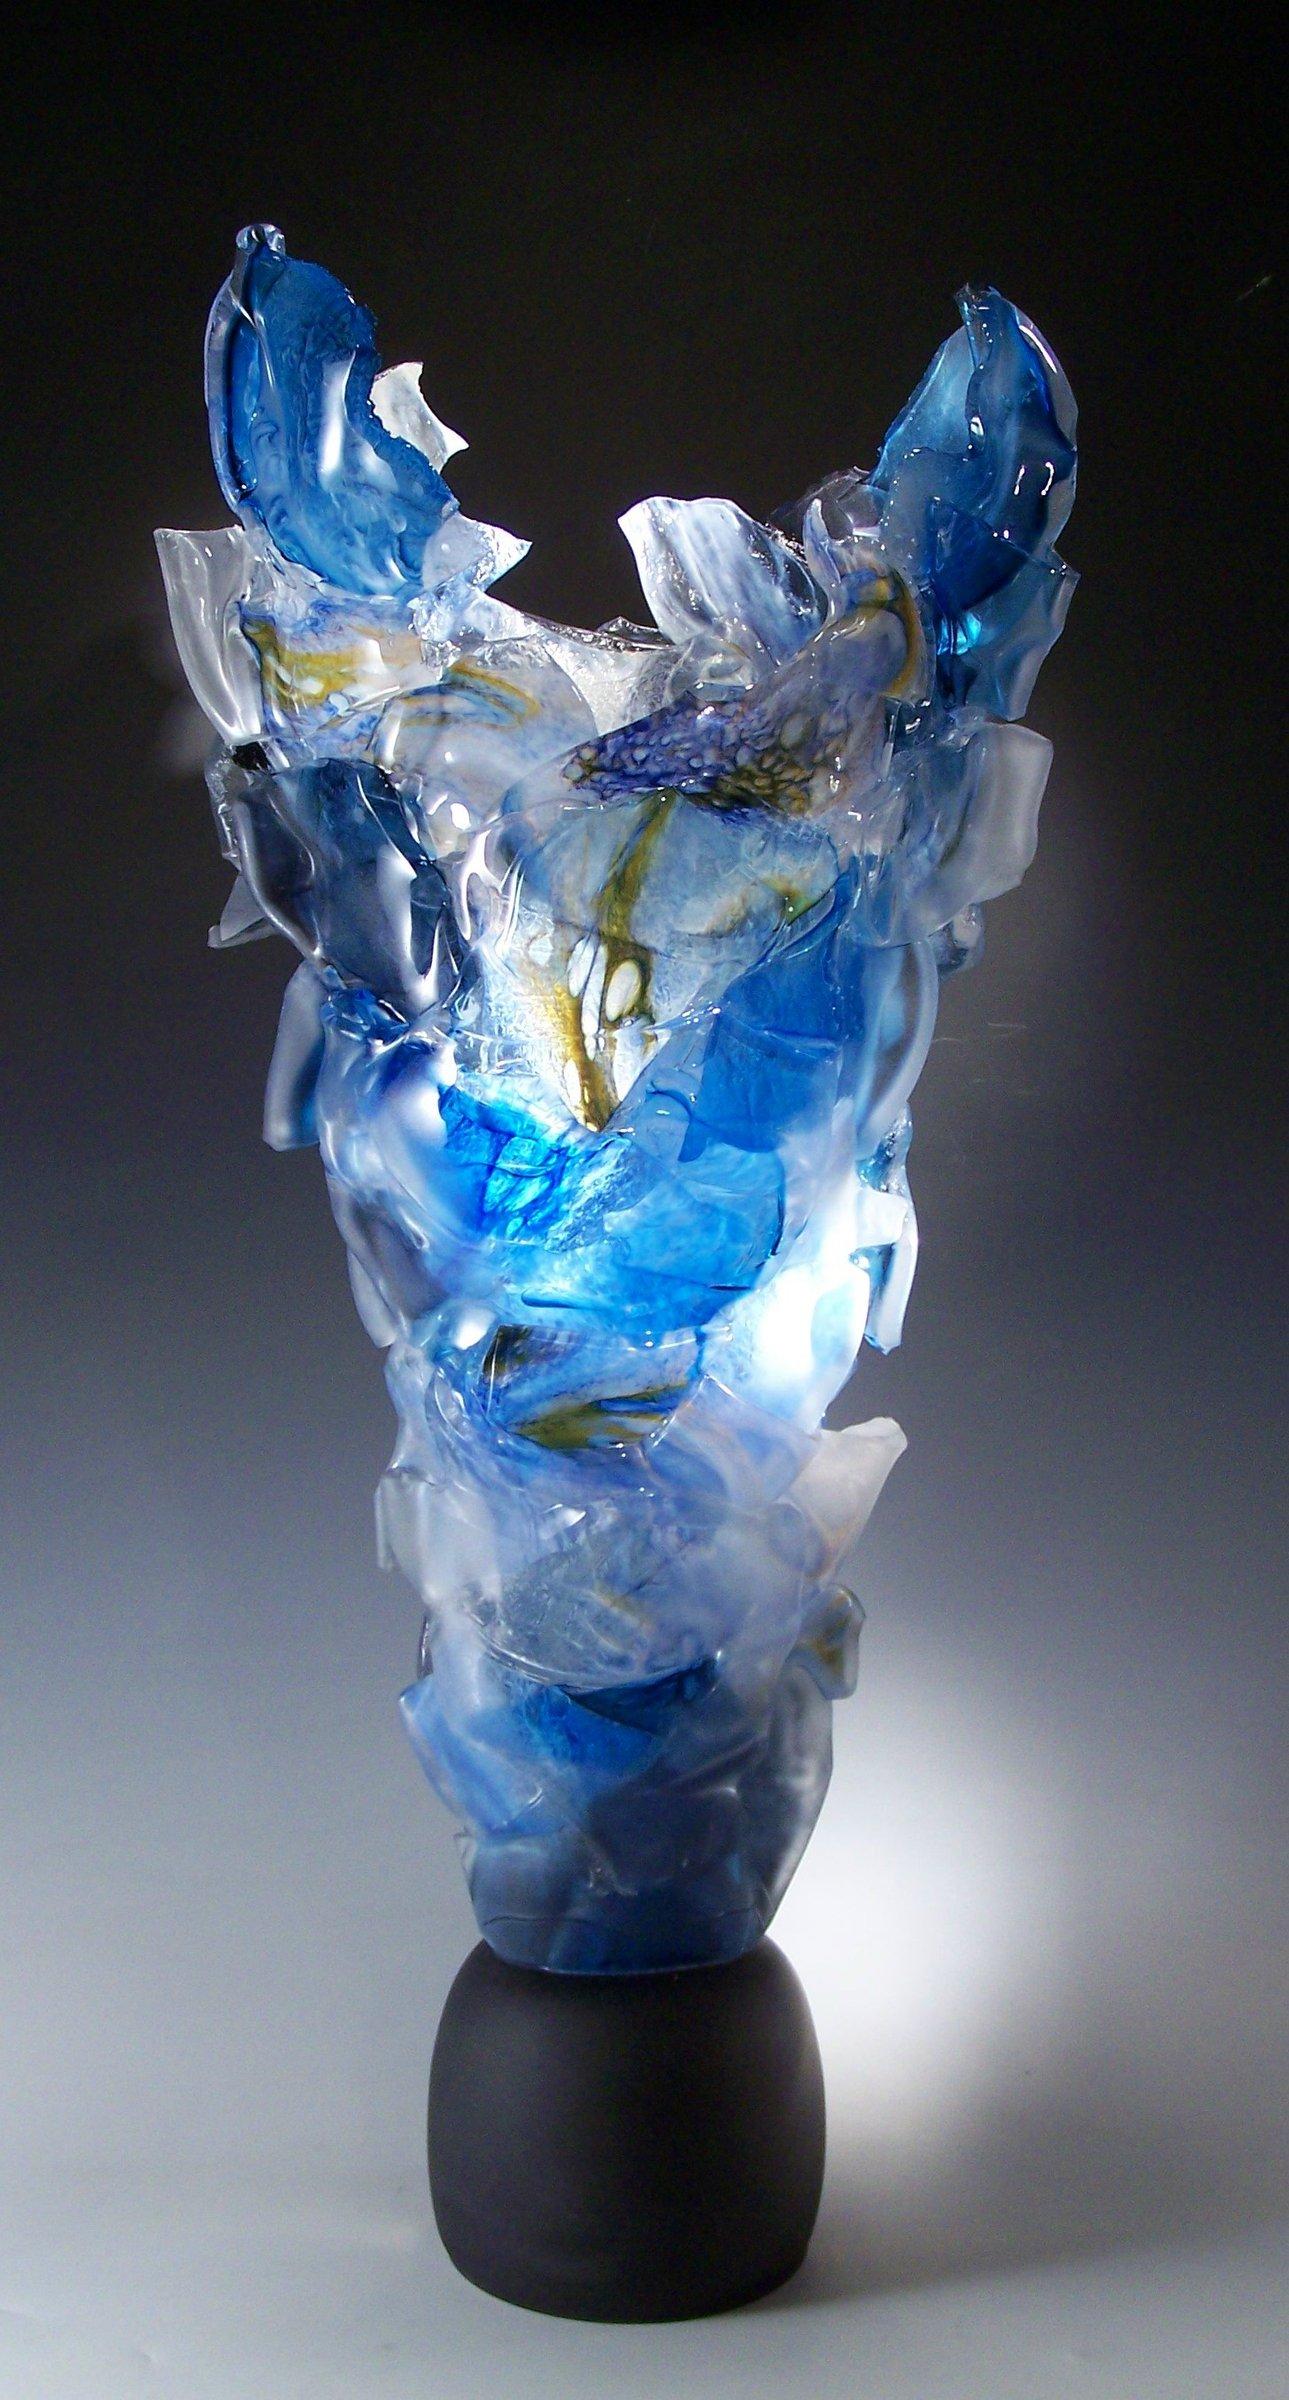 Blue Monument By Caleb Nichols Art Glass Sculpture